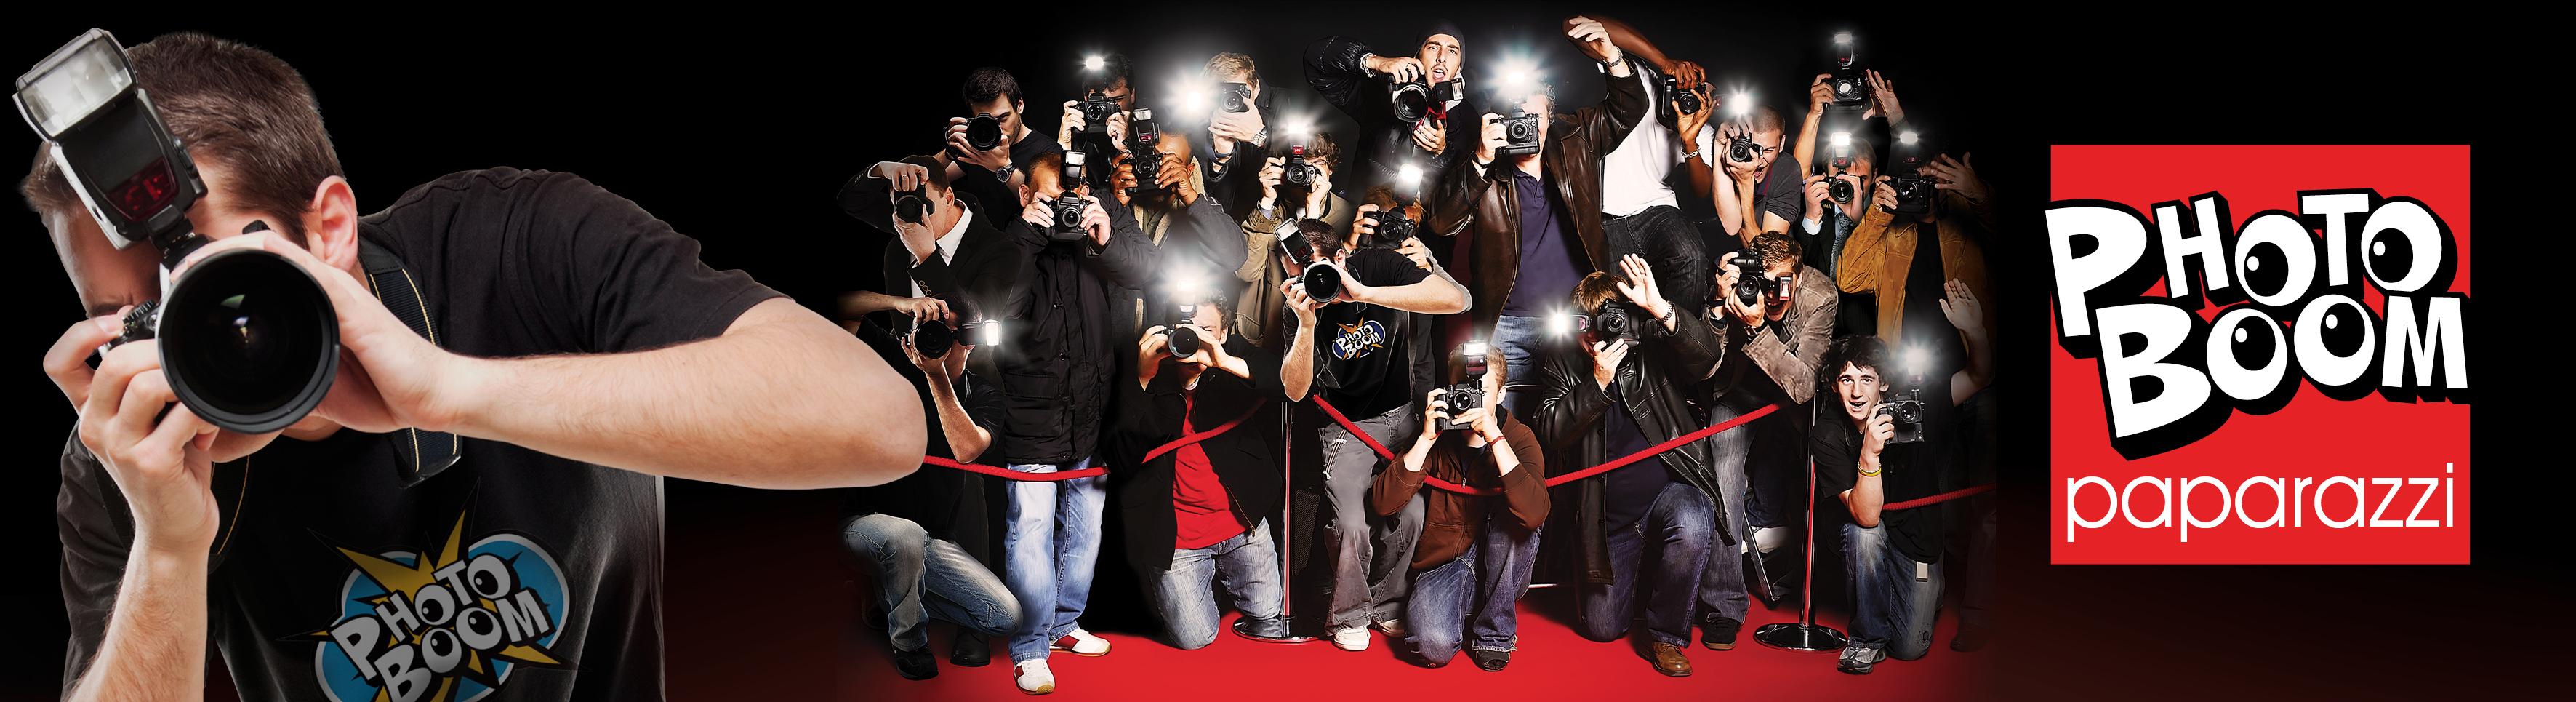 PhotoBoom Paparazzi